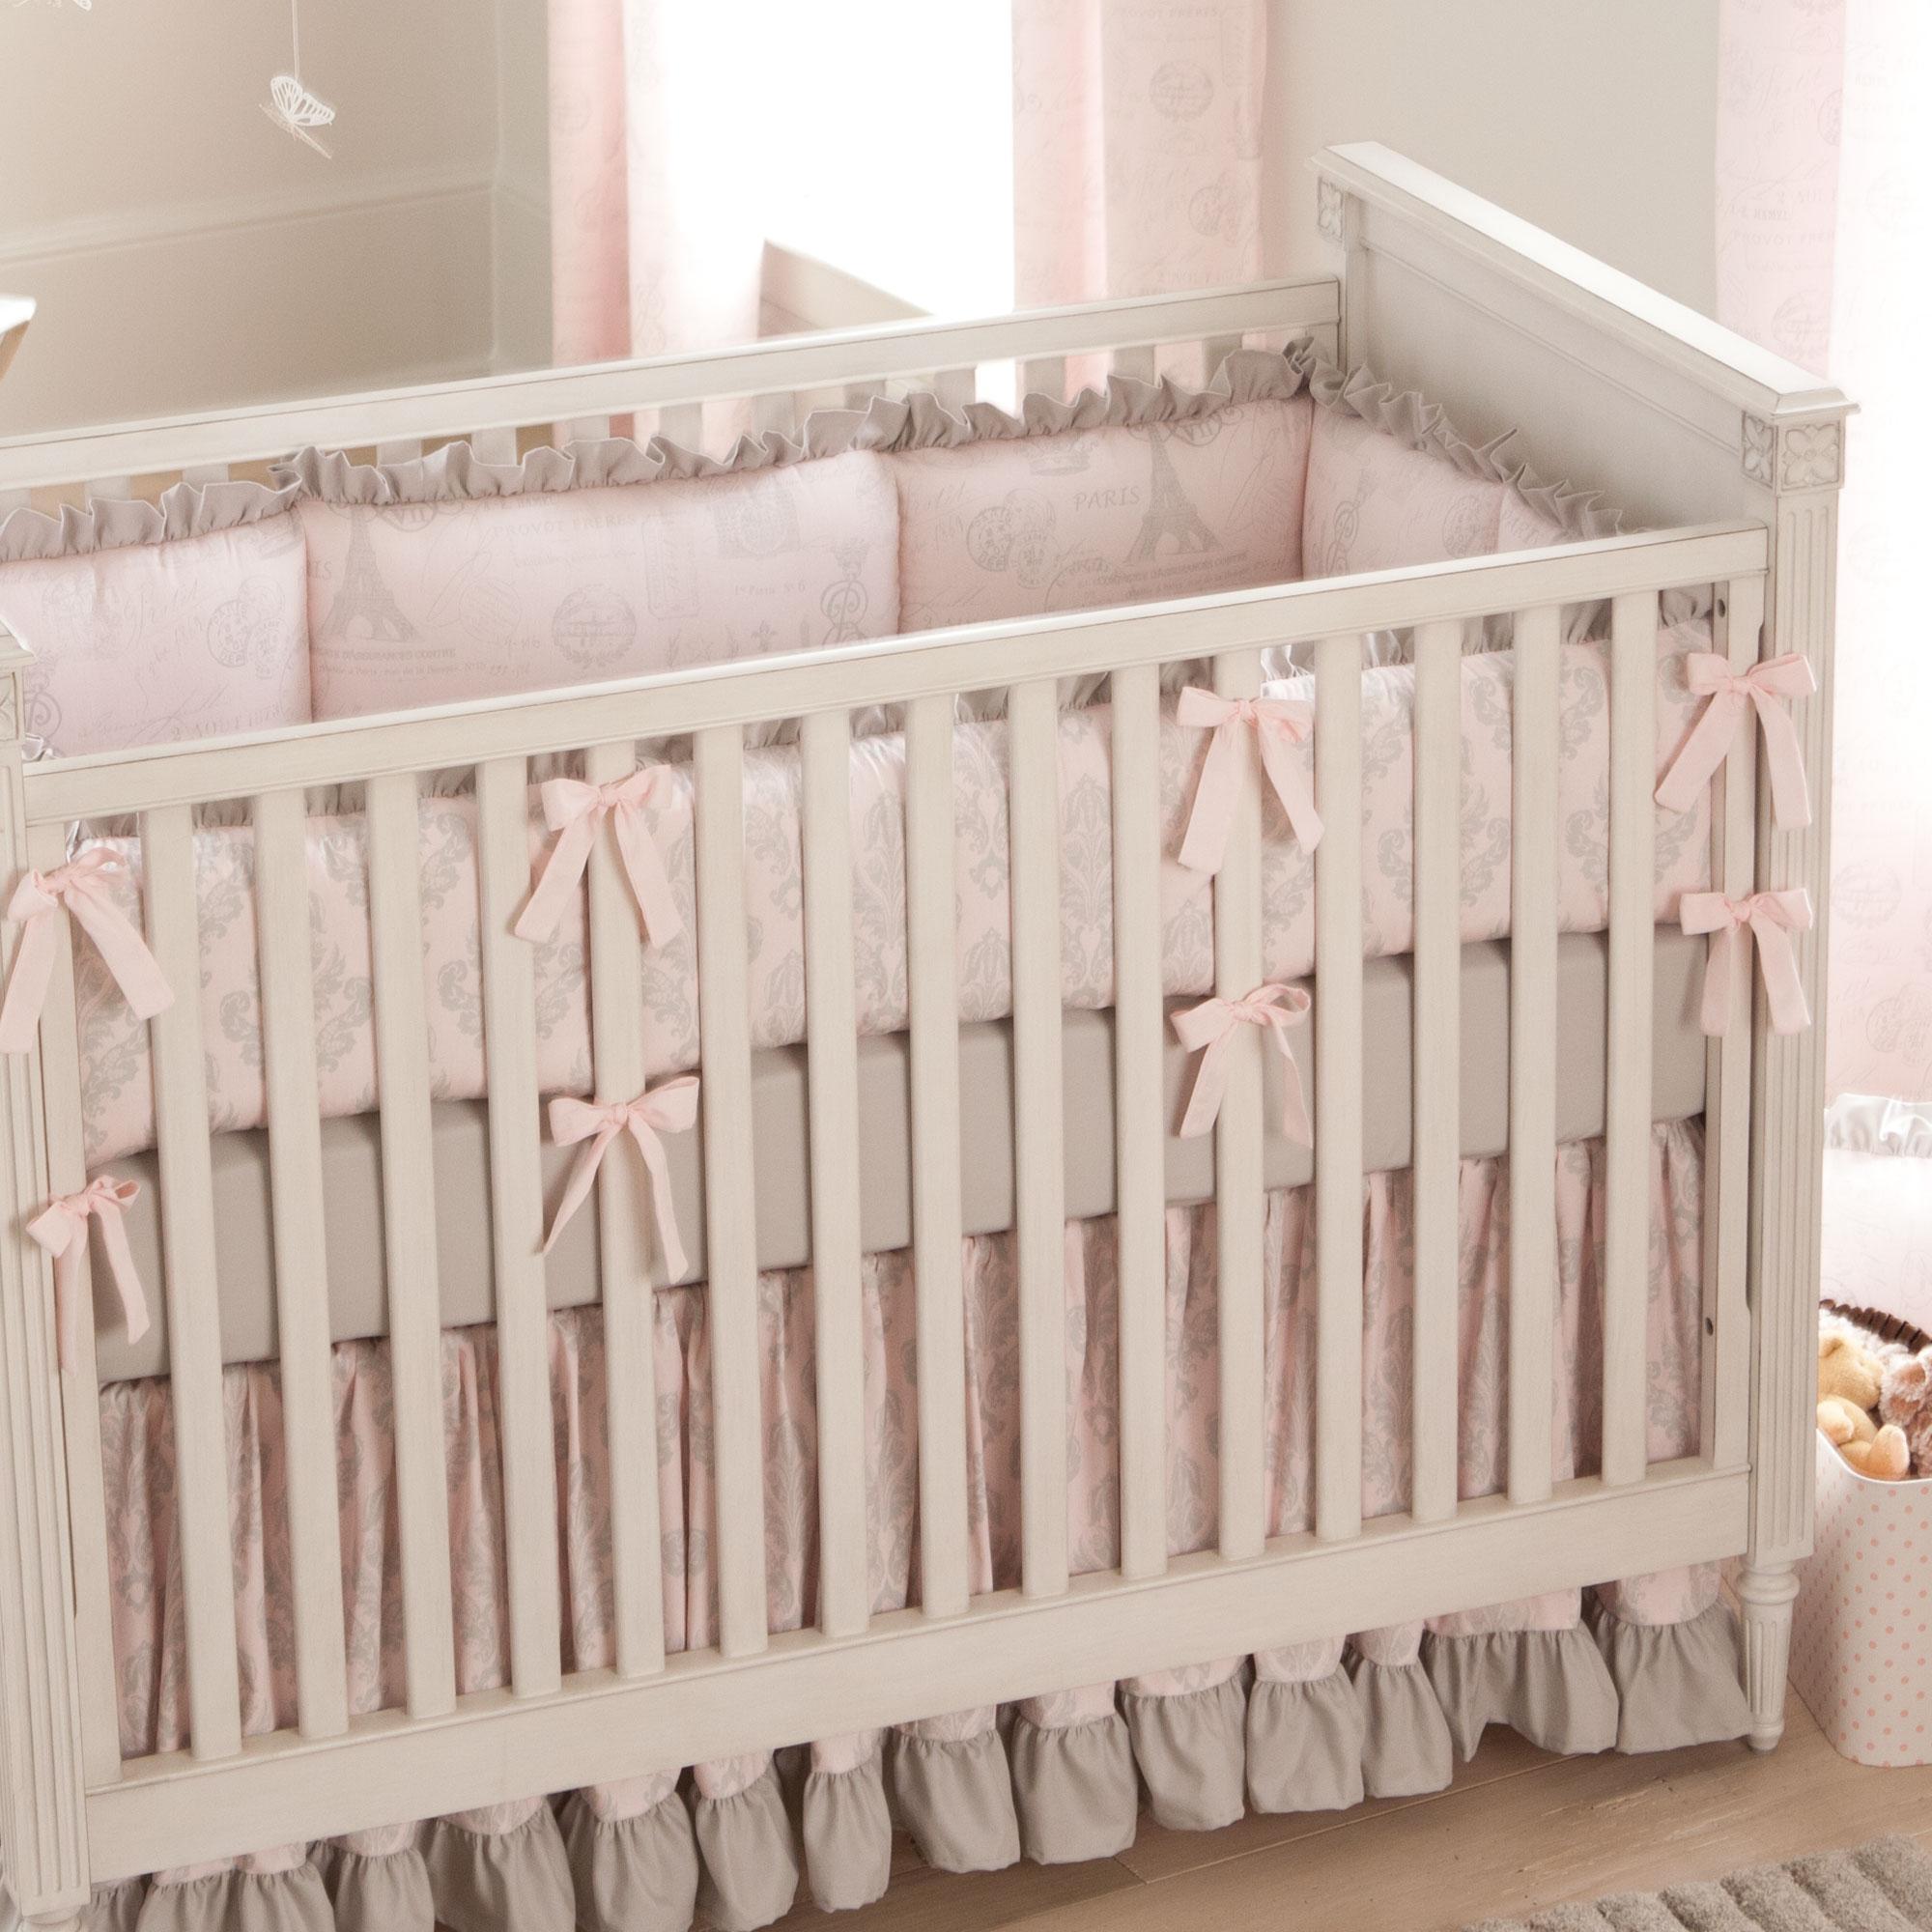 cot bedding paris script baby crib bedding KWTWSXF